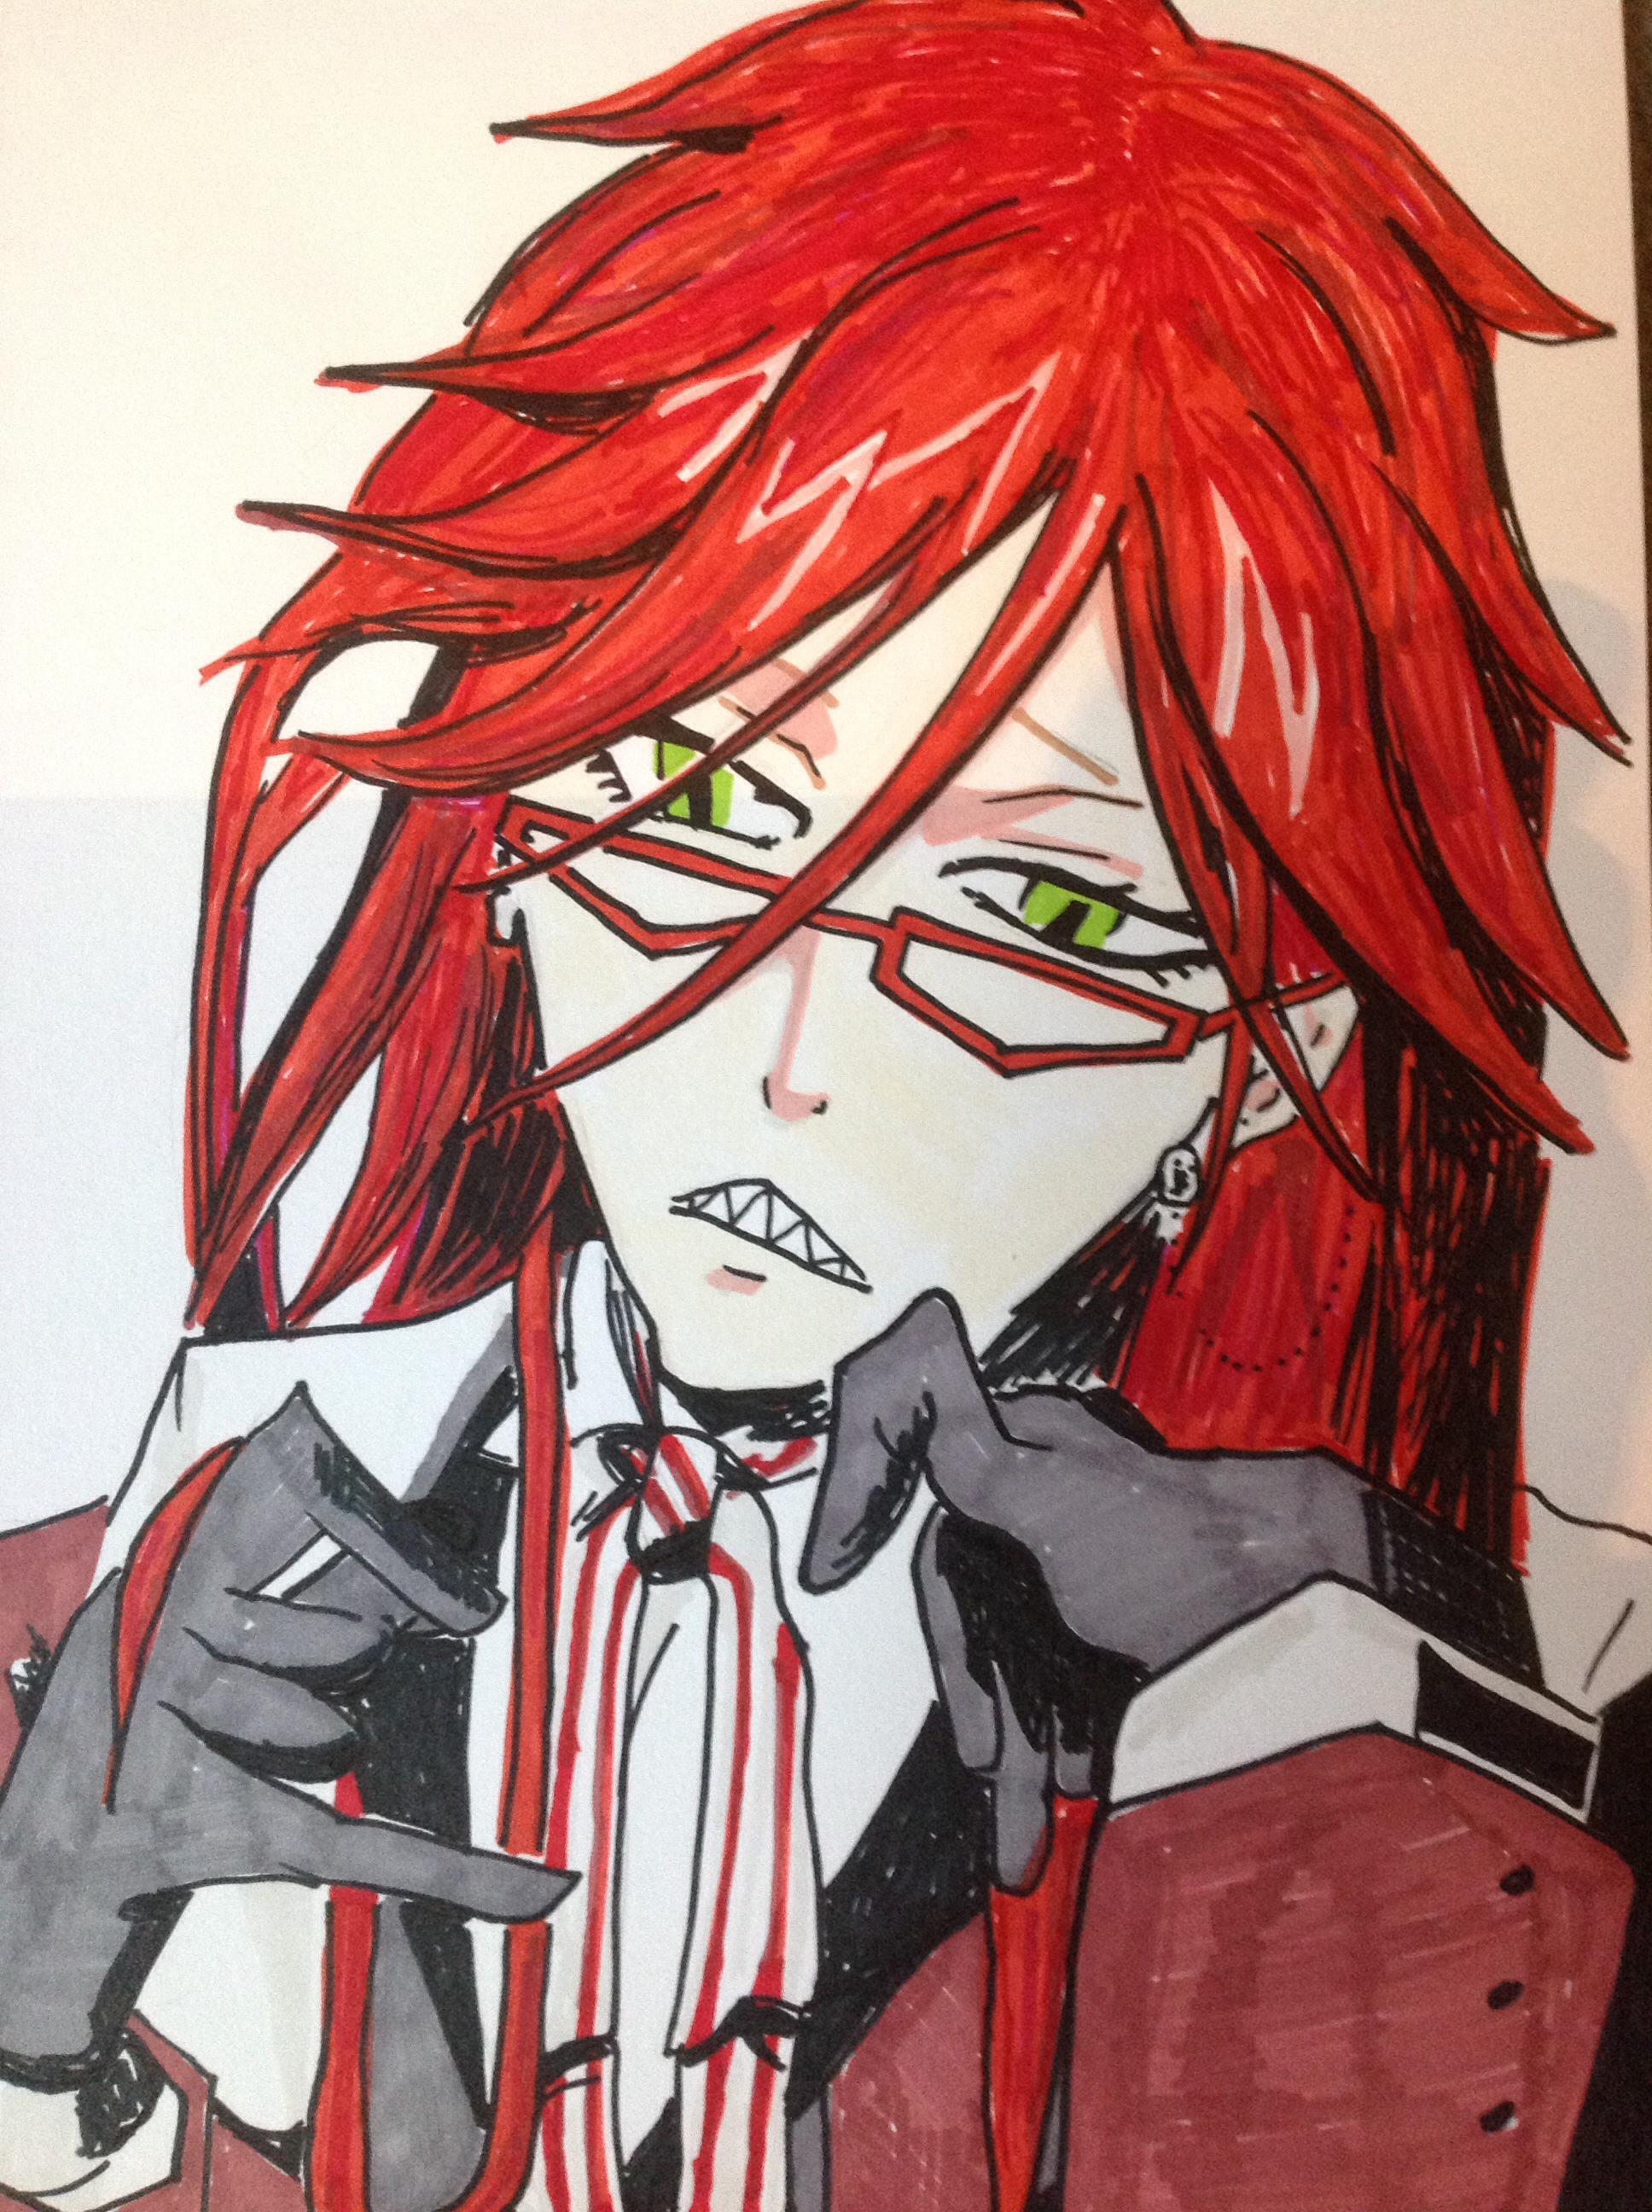 Drawn scythe black butler Red scythe Grell Sutcliff Grell